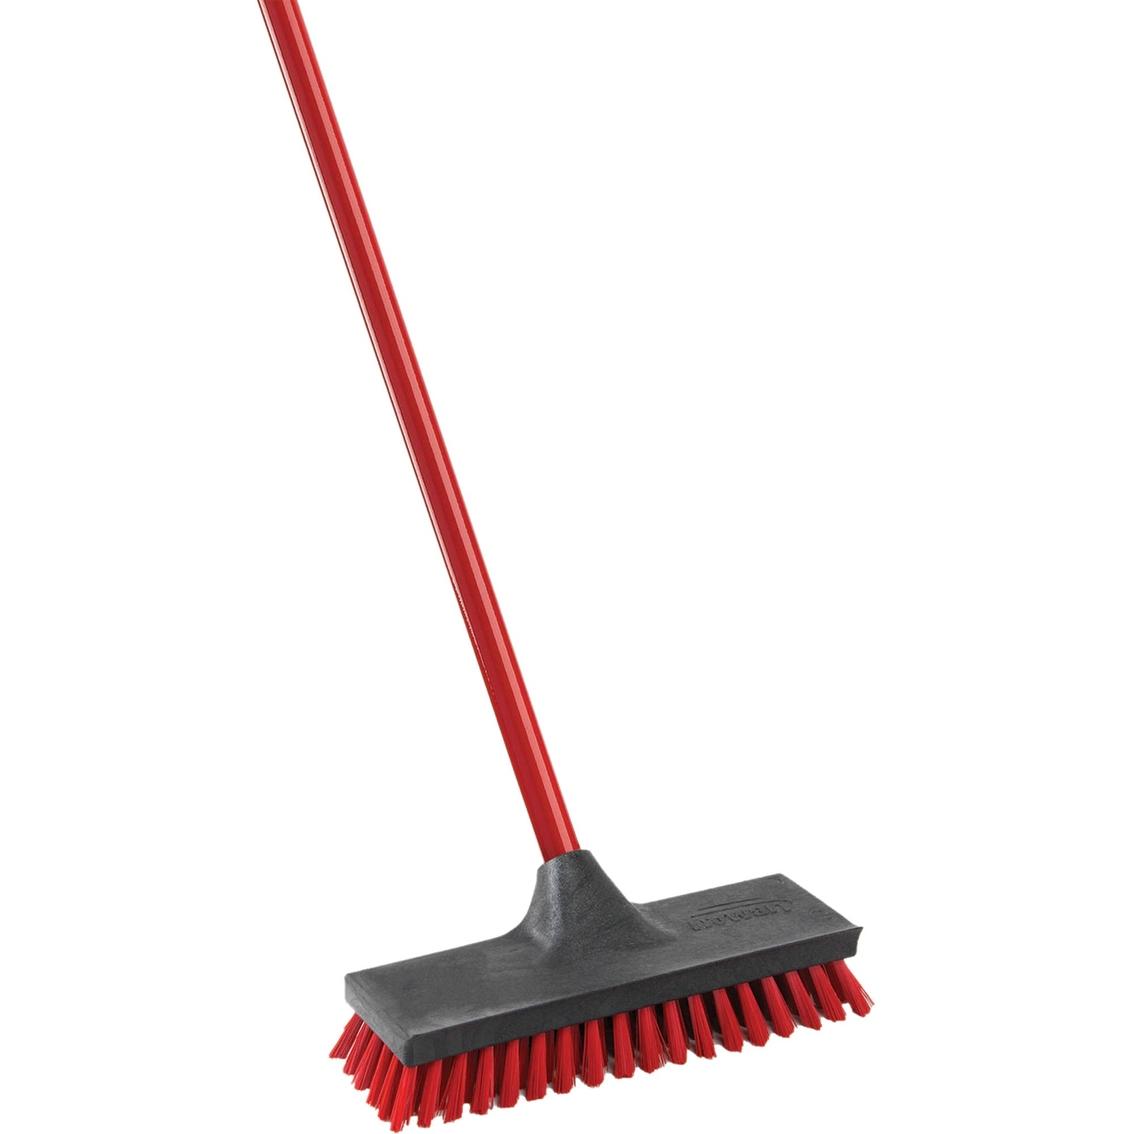 Libman floor scrubber garage cleaning more shop the for Garage floor cleaner powder